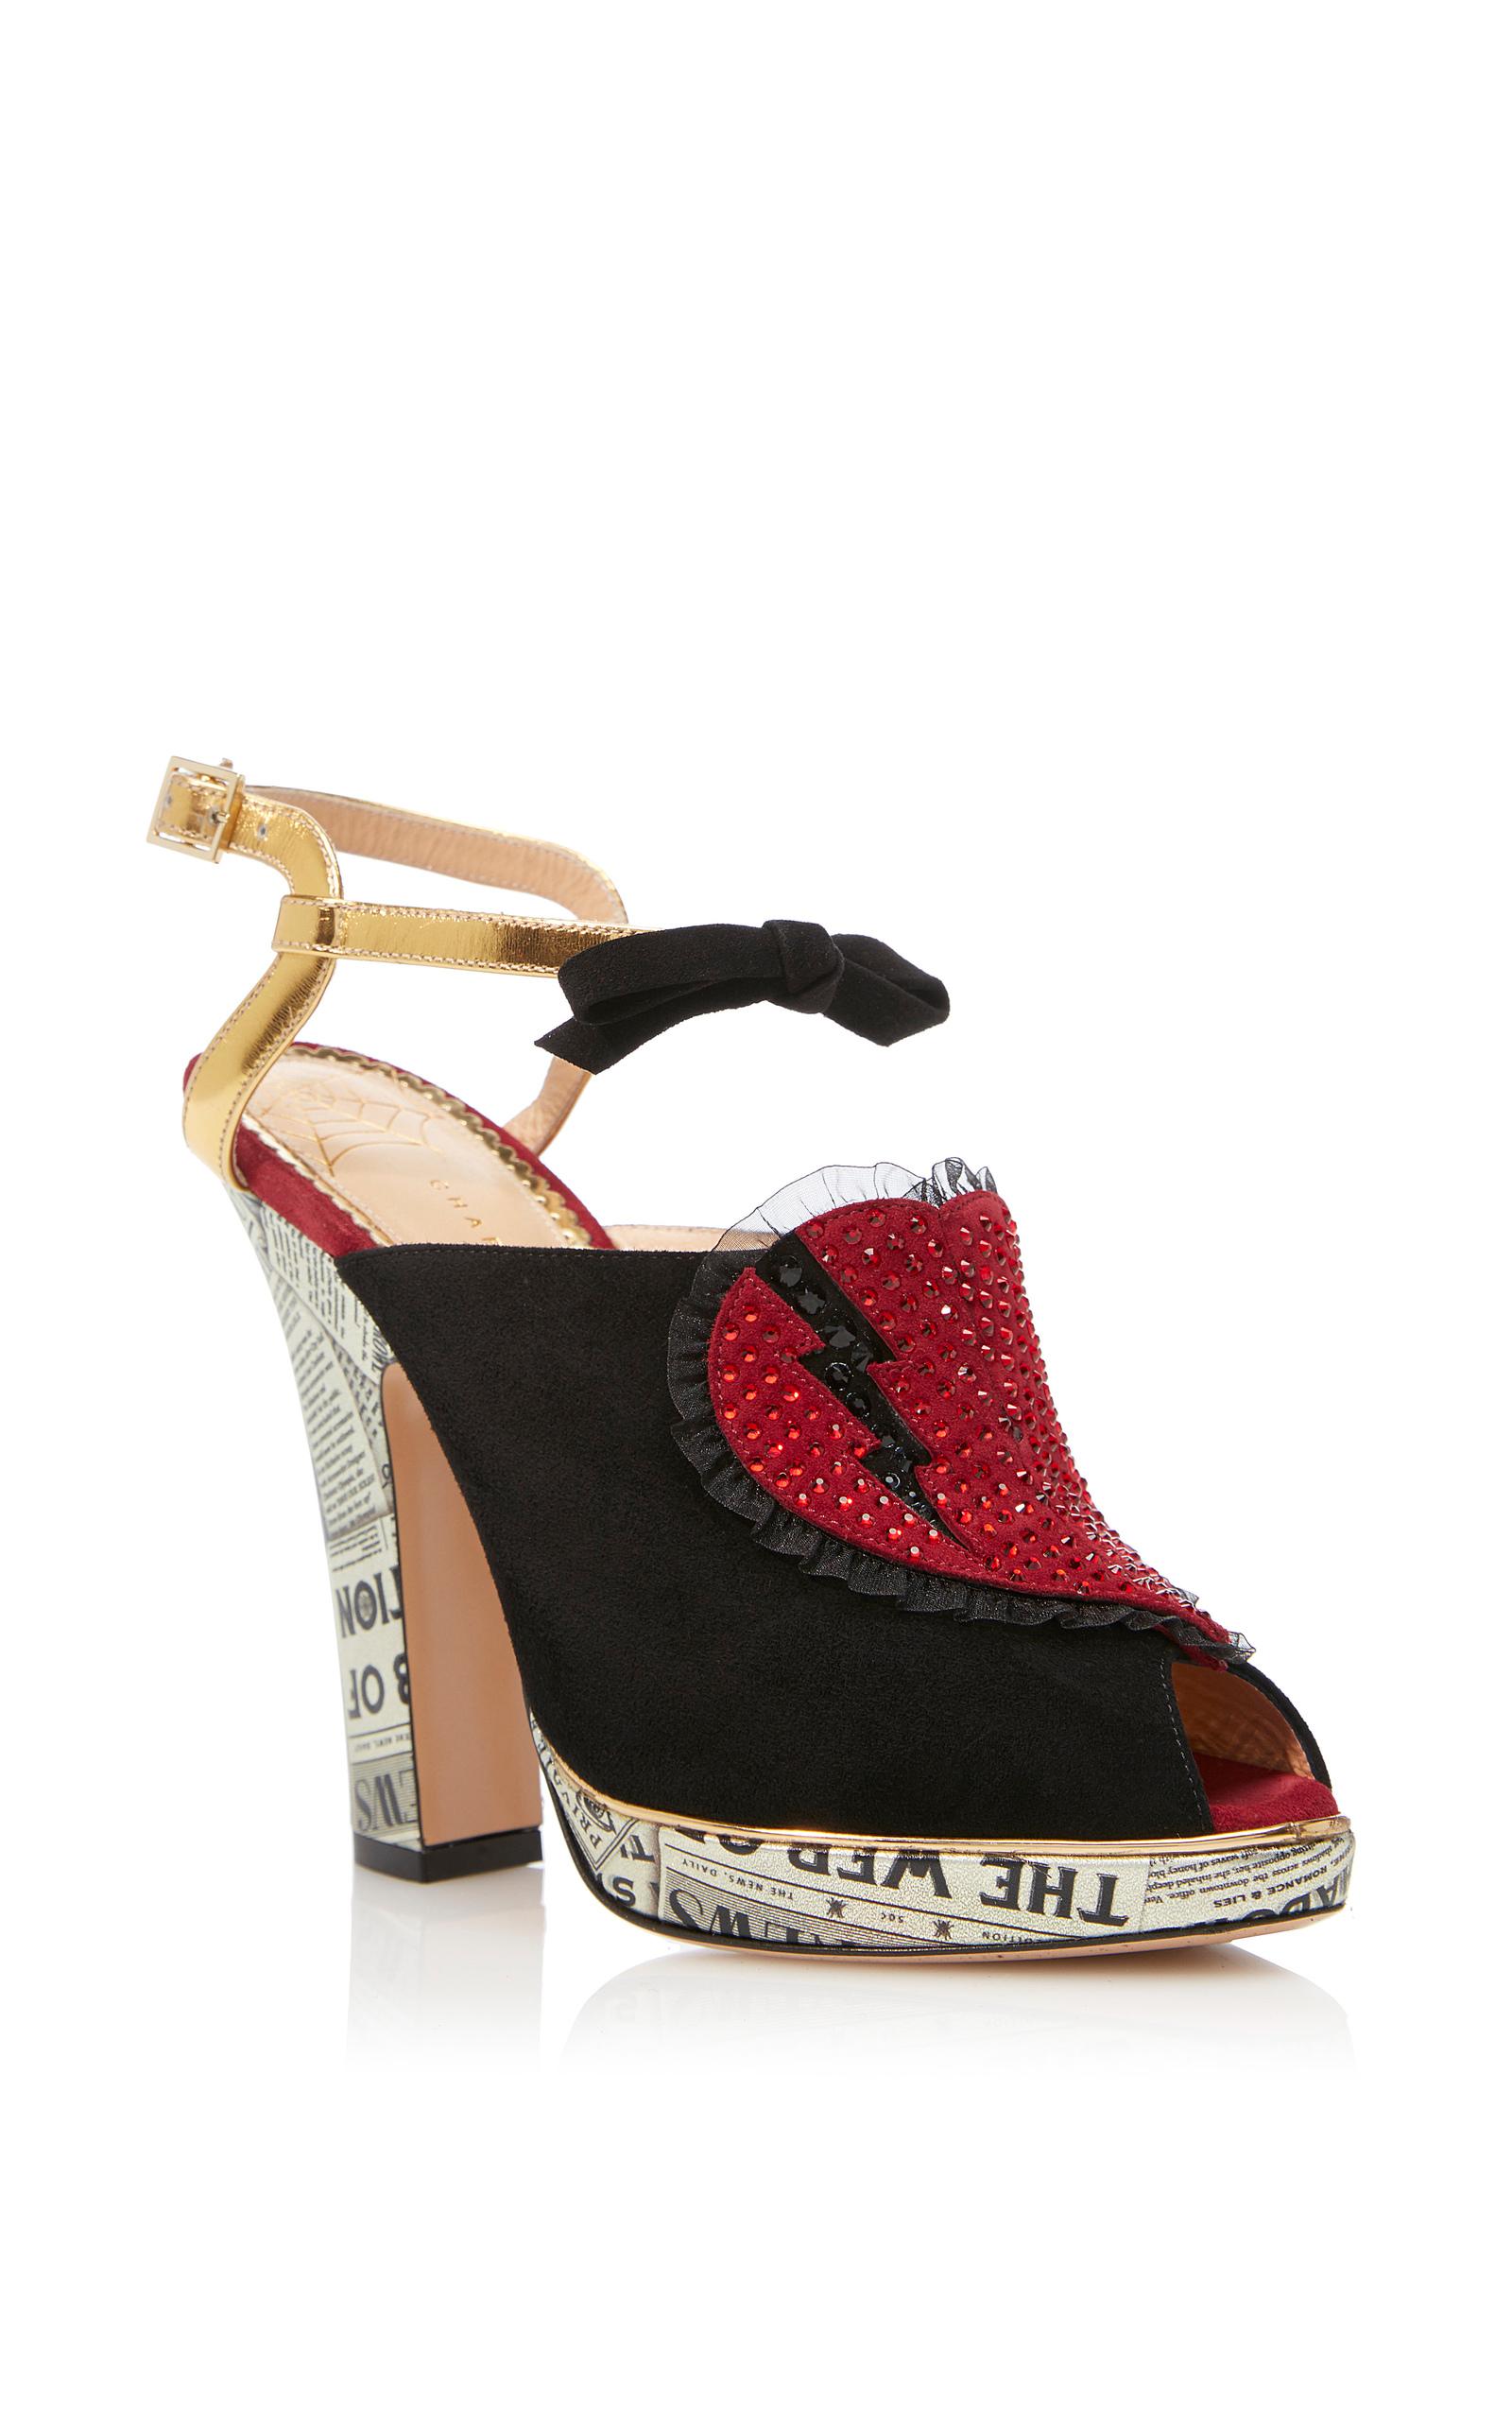 1dcc276068 Killer Heels by Charlotte Olympia   Moda Operandi